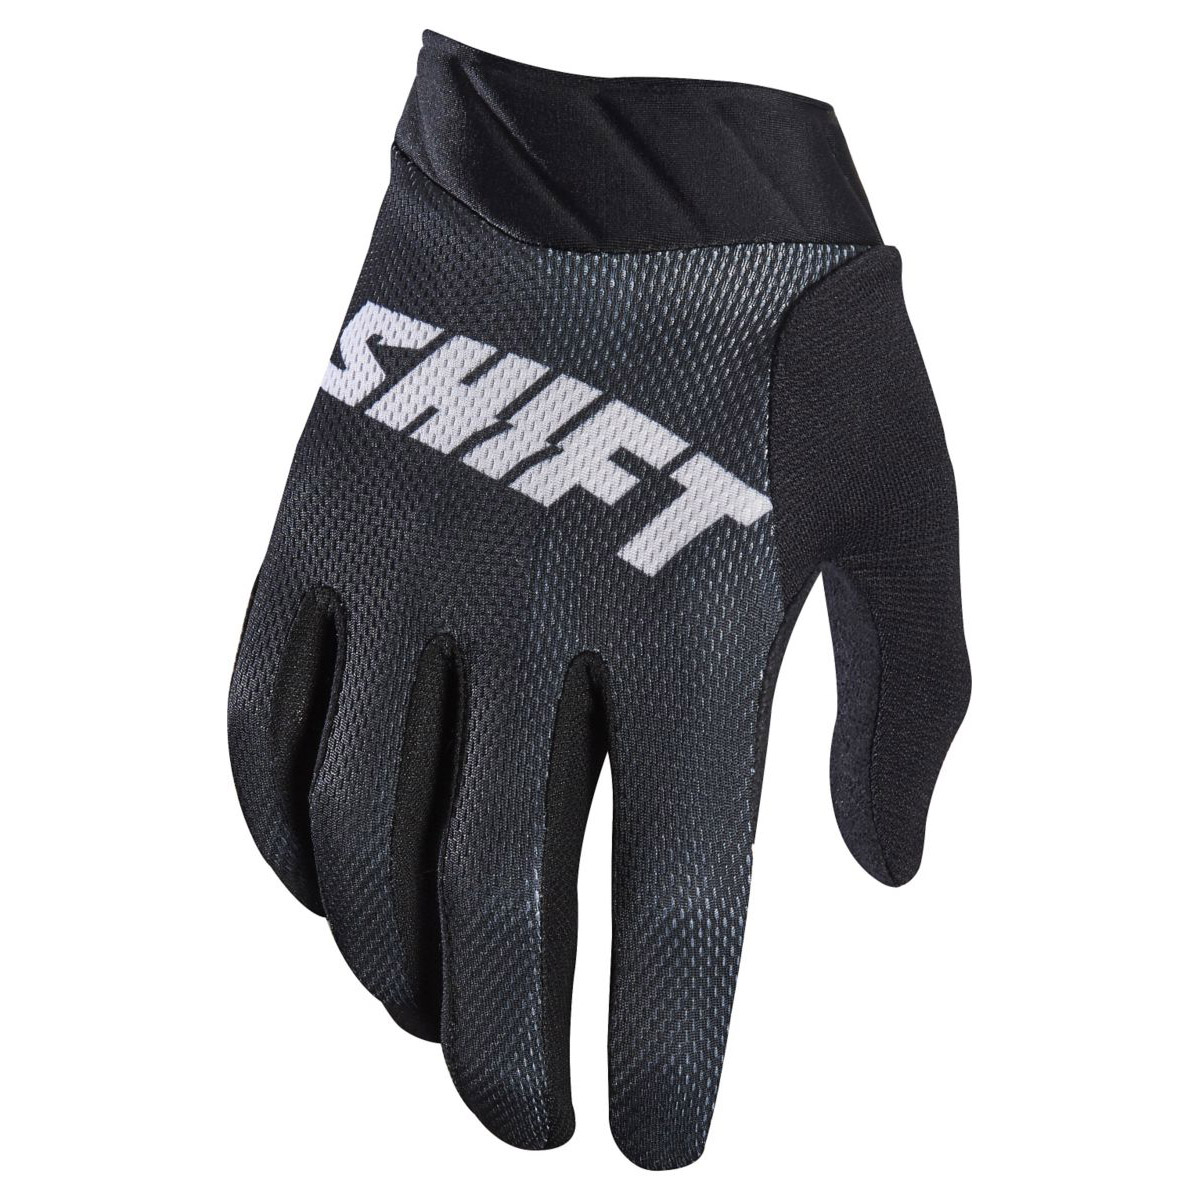 Shift - 2017 3LACK Label Air перчатки, черные